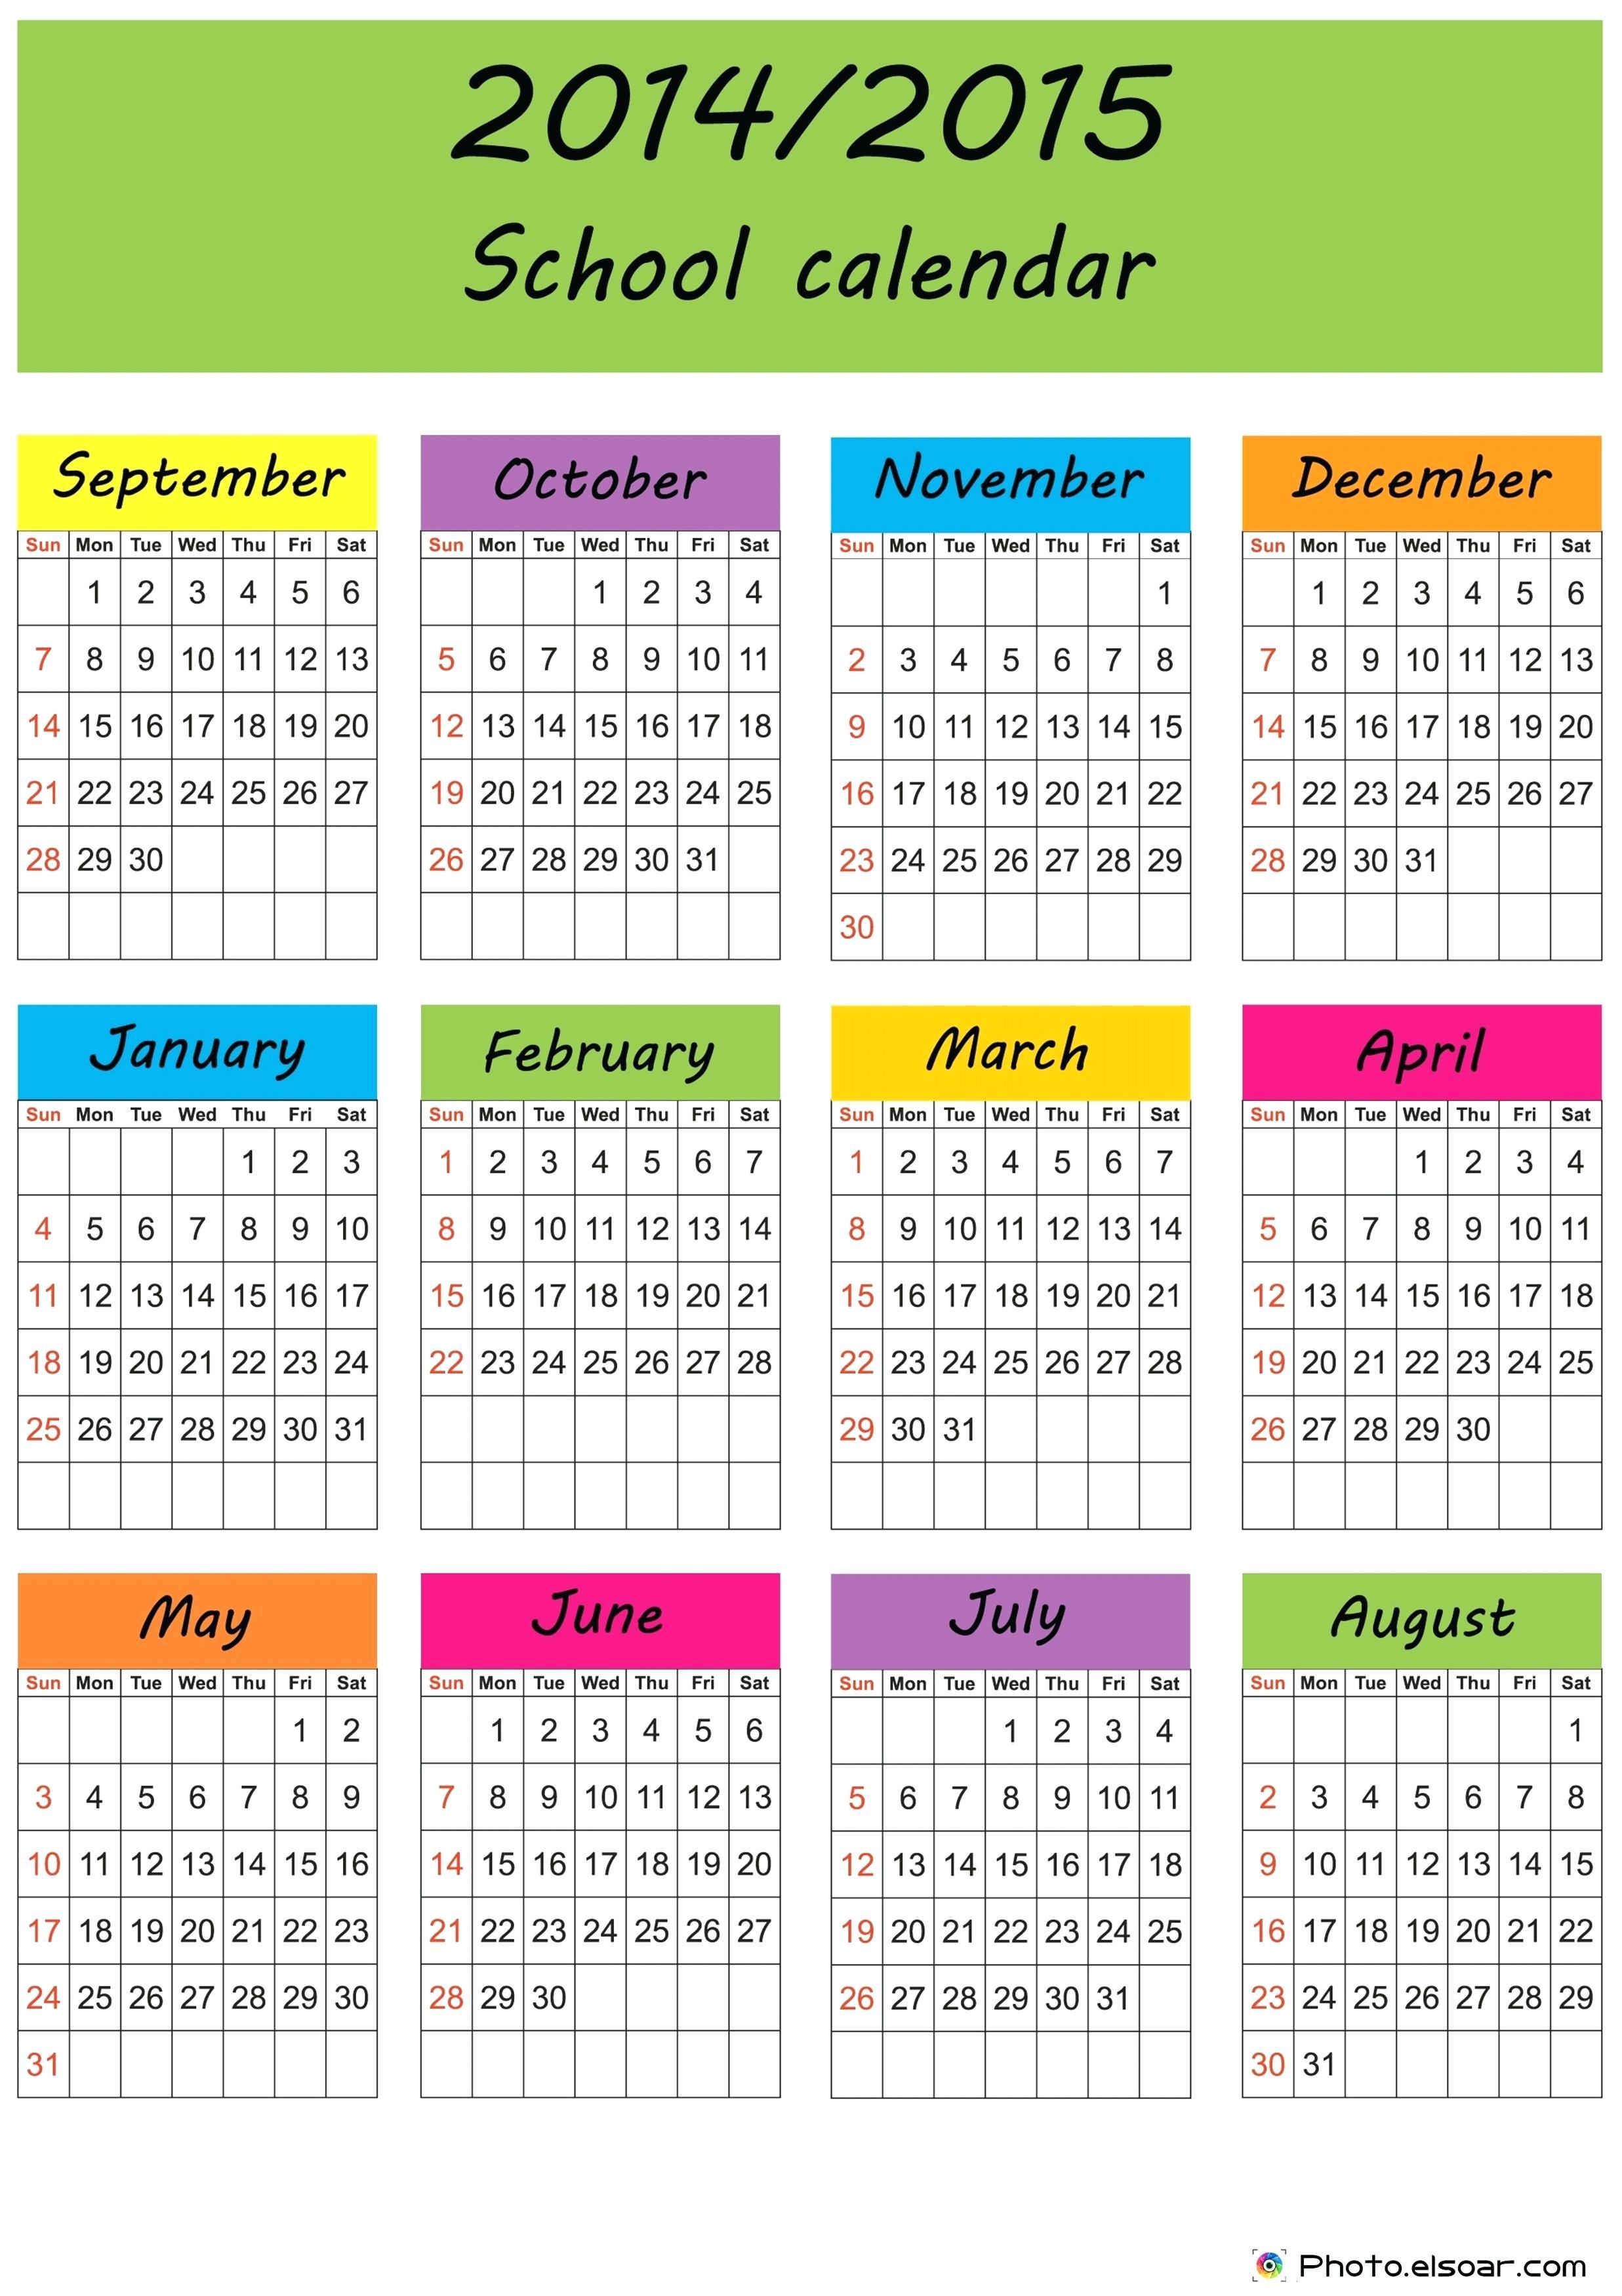 2014 15 academic calendar template